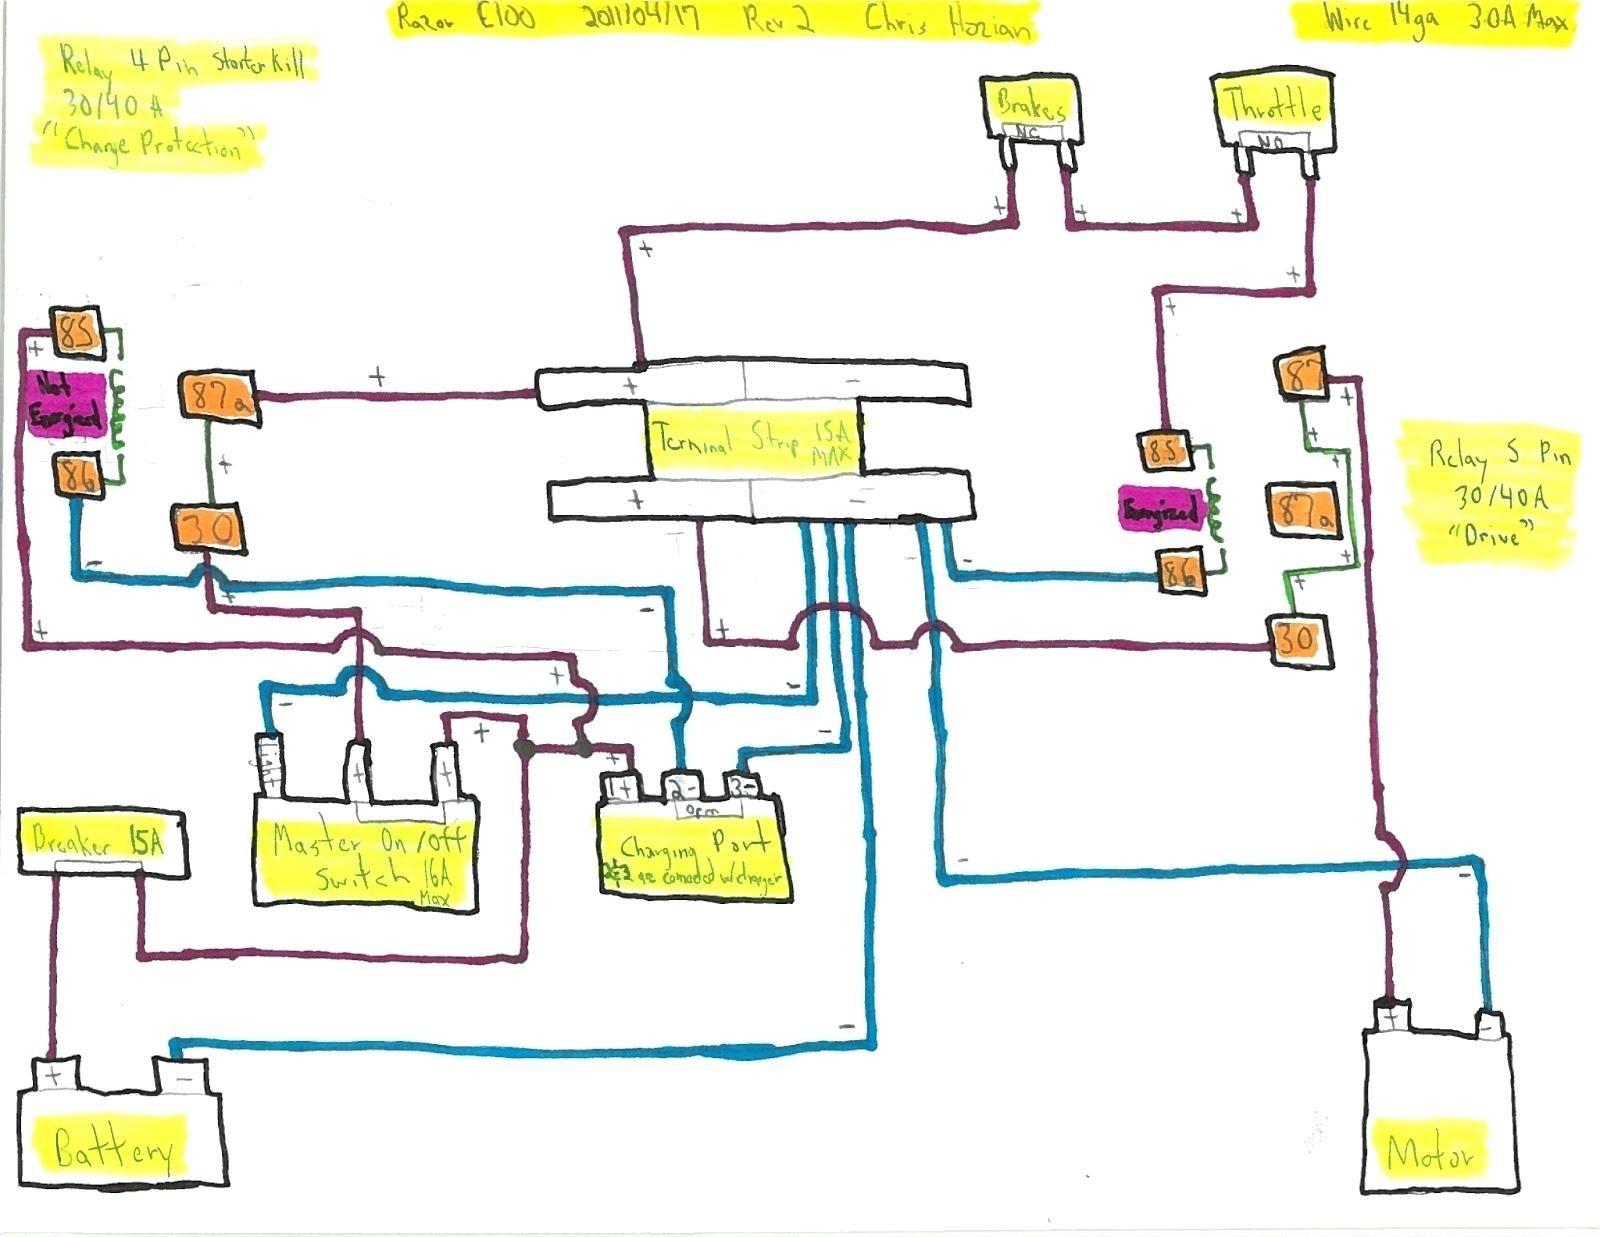 hight resolution of razor e300 wiring schematic trusted wiring diagram razor e200 parts diagram razor e200 wiring diagram